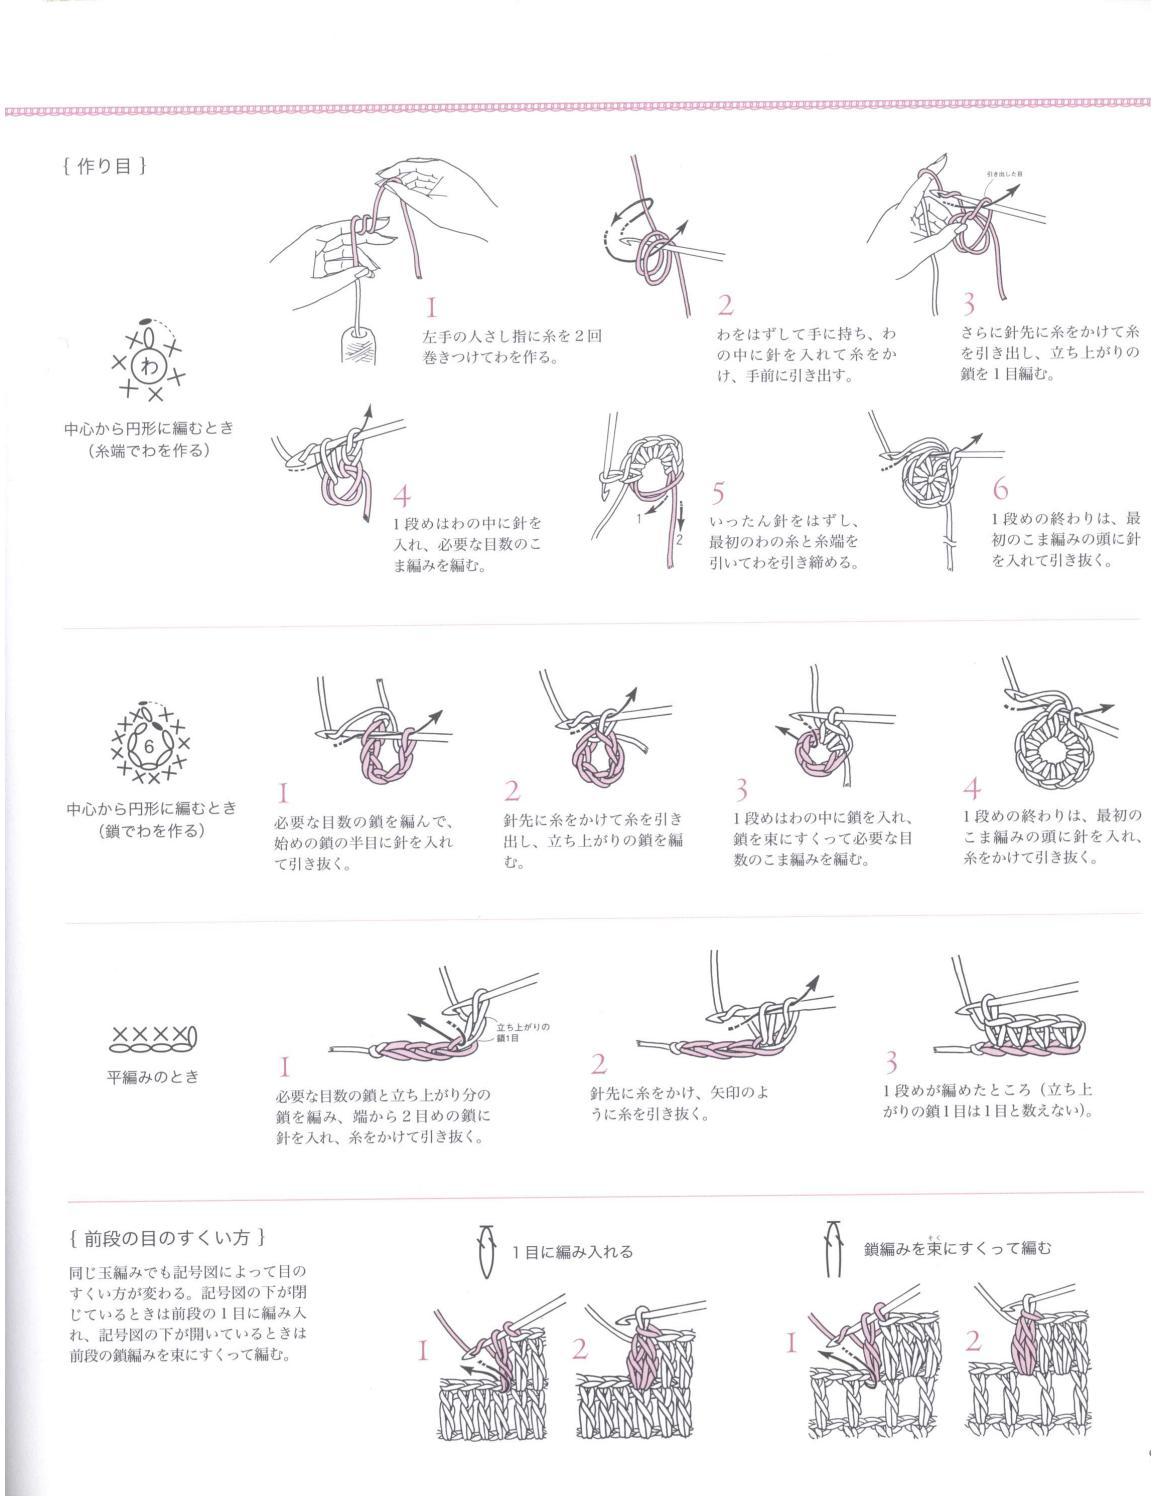 Asahi original crochet best selection 2012 page 91